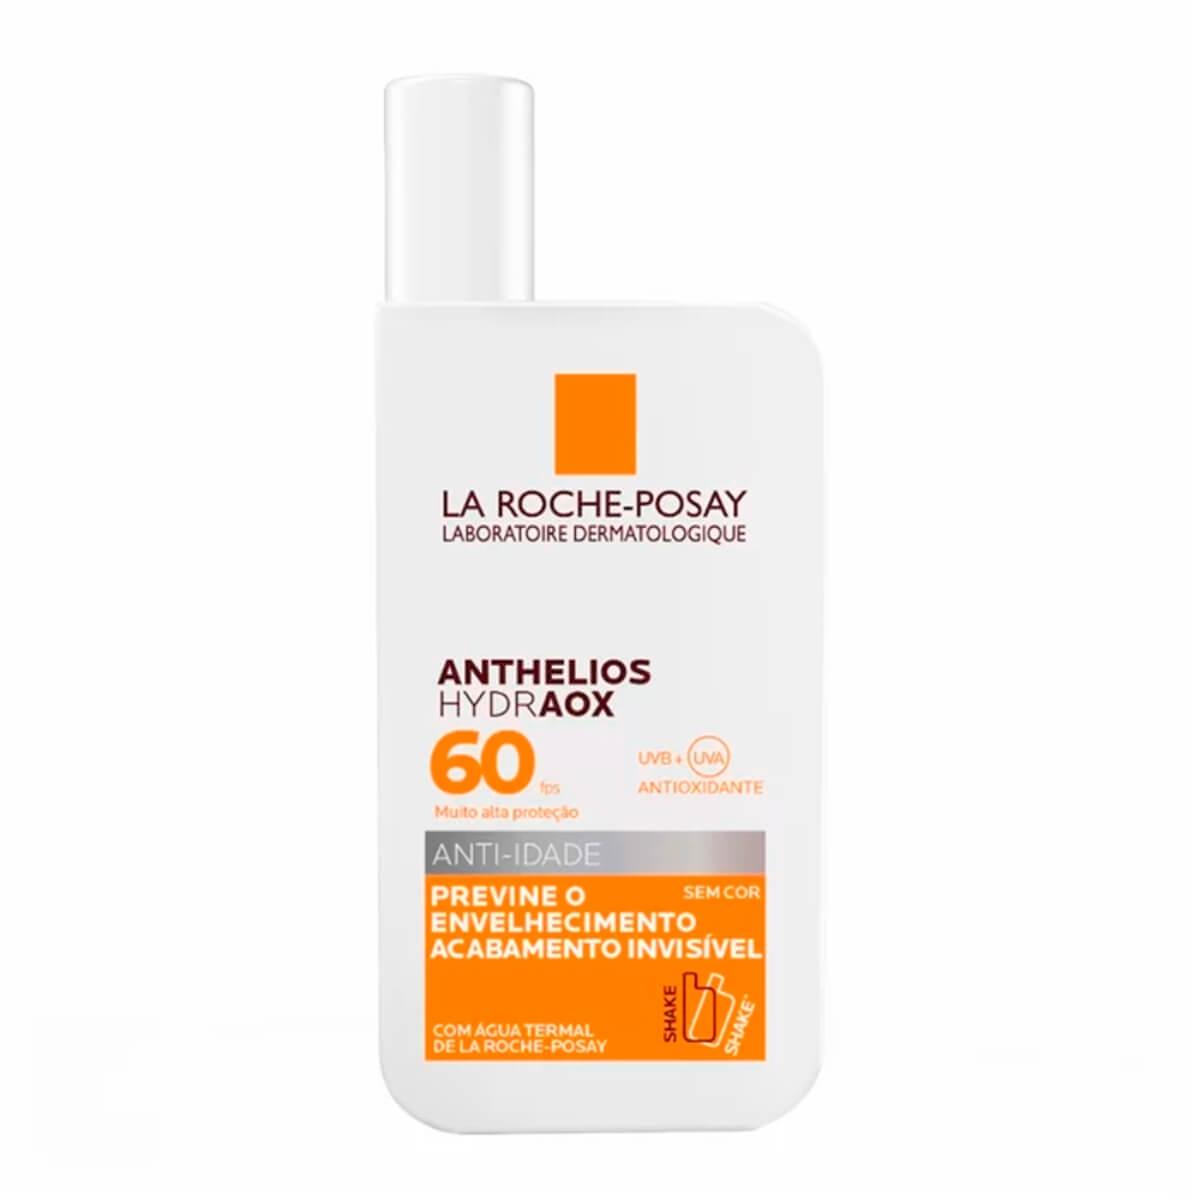 Protetor Solar Facial La Roche-Posay Anthelios Hydraox Anti-Idade FPS 60 com 50g 50g